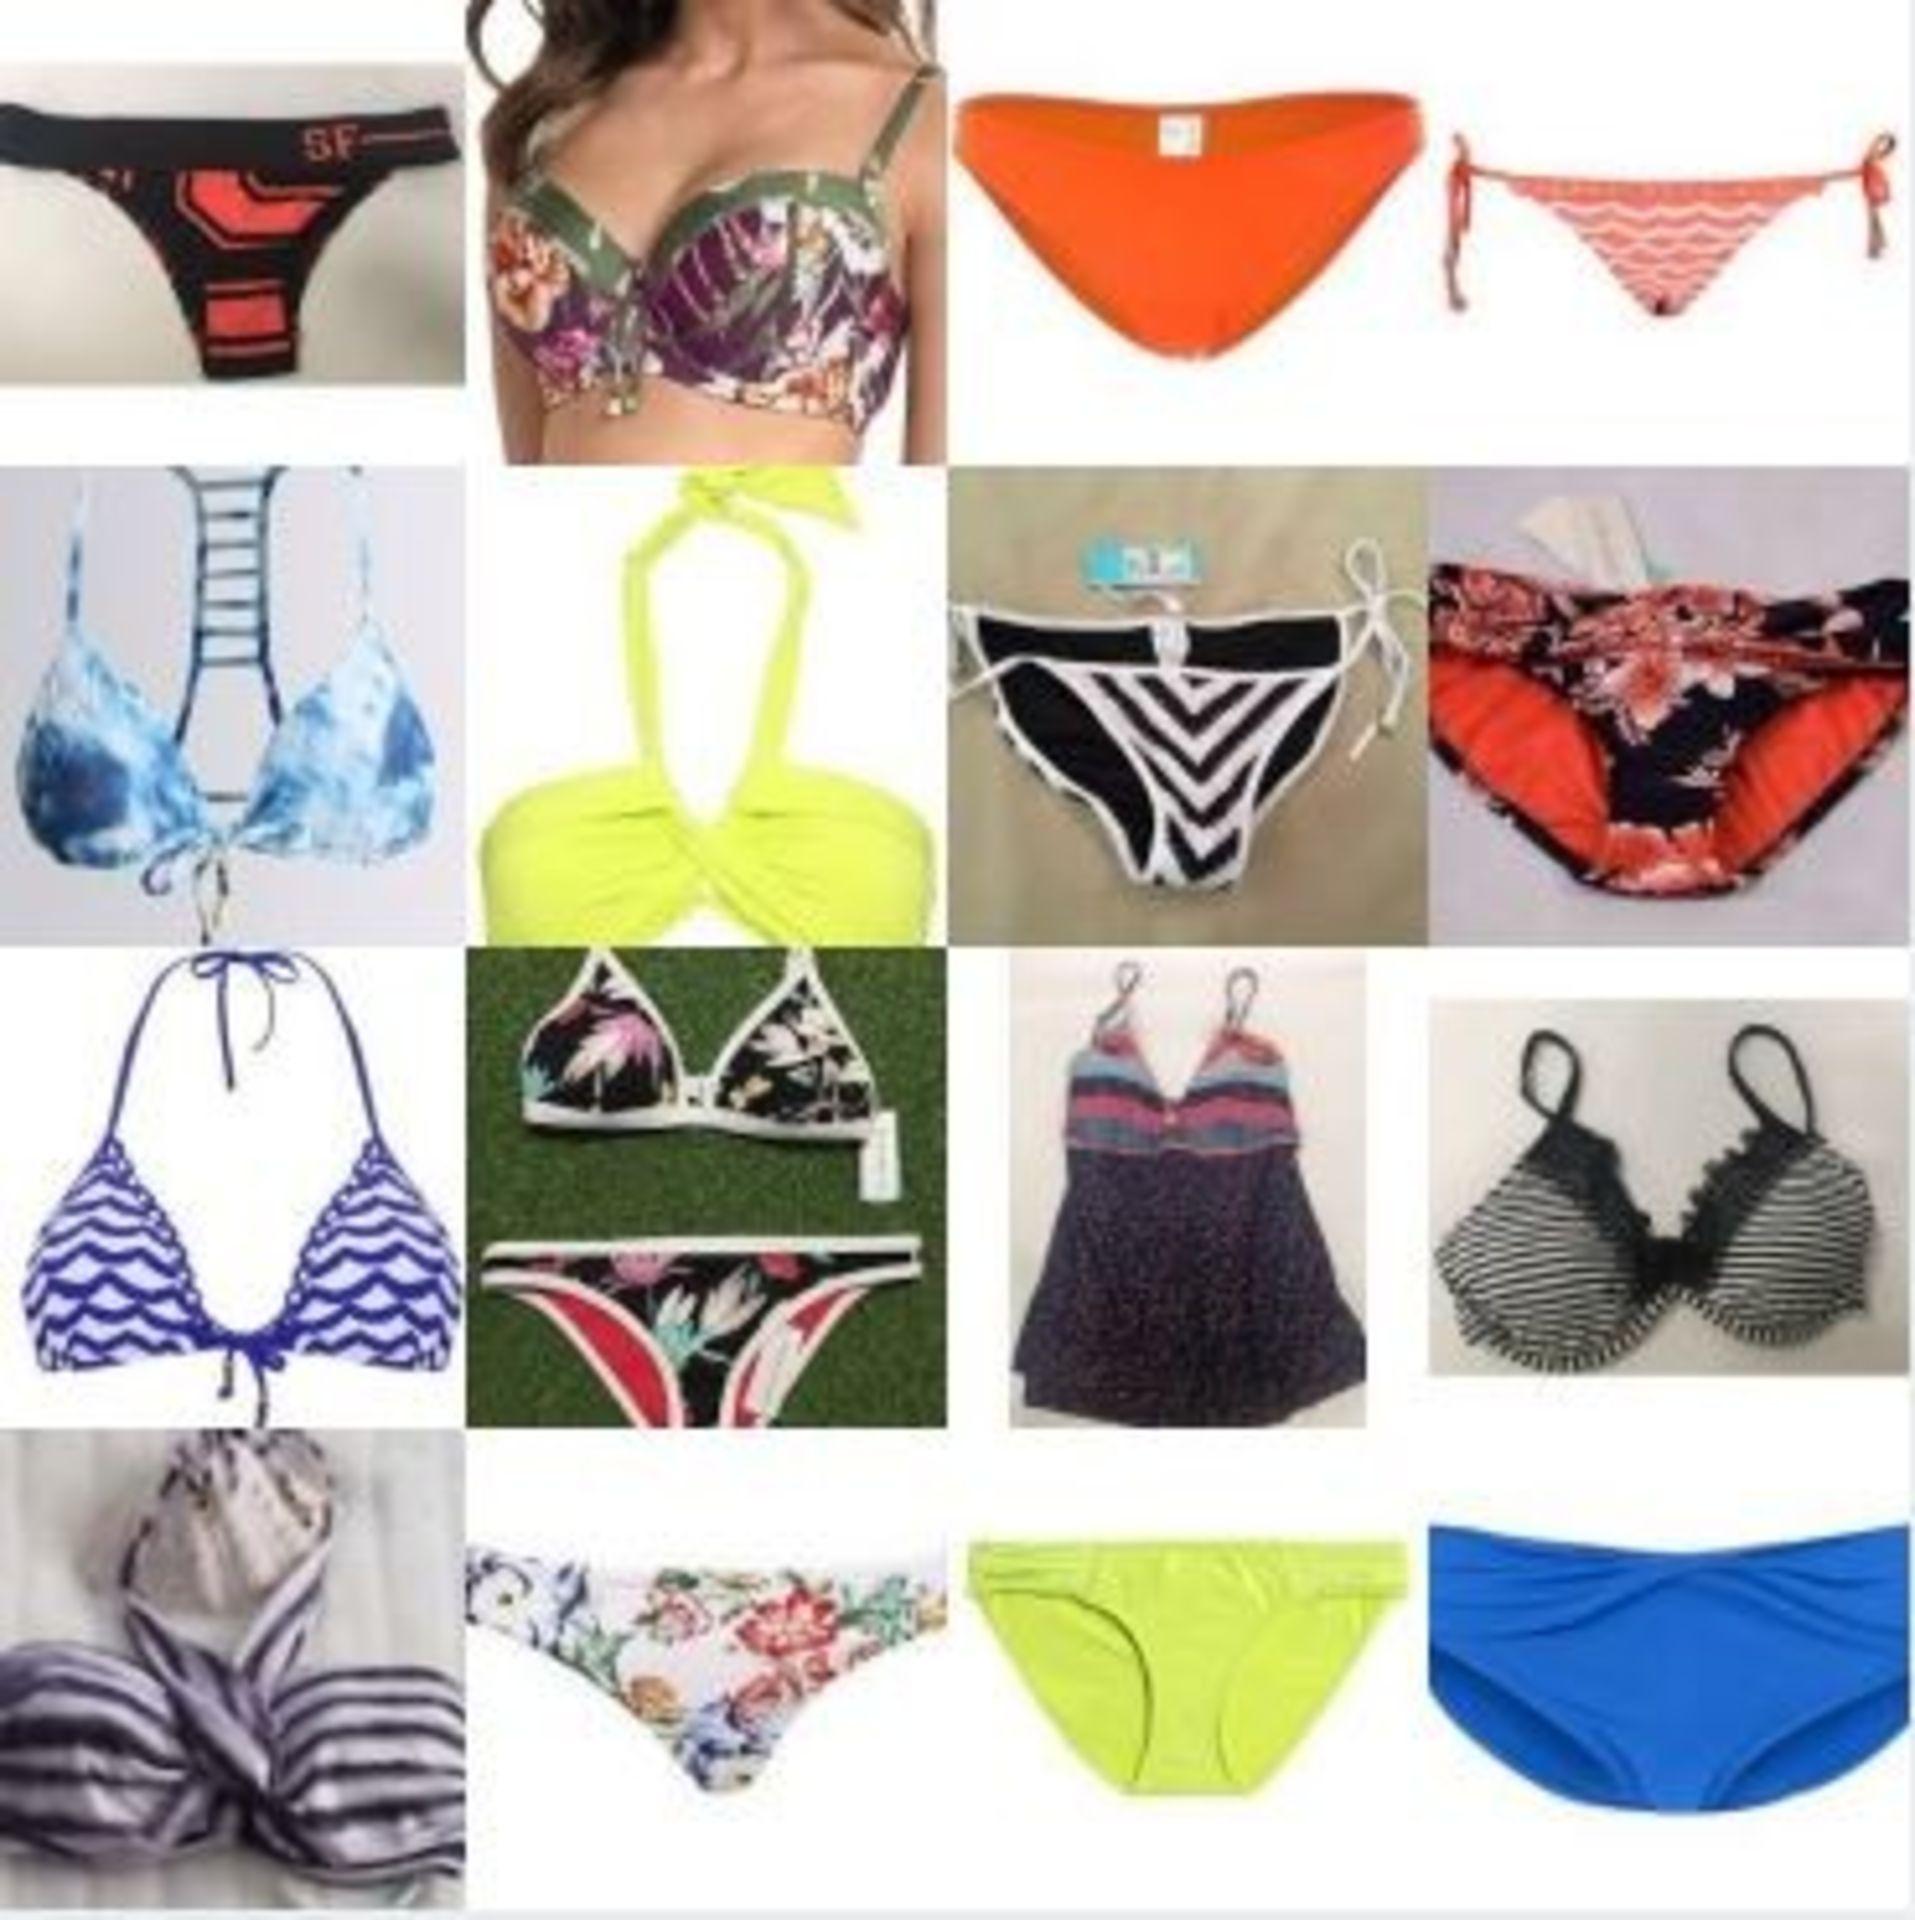 Lot 35 - Sourced From Big Brand Bikini Manufacturer SeaFolly: